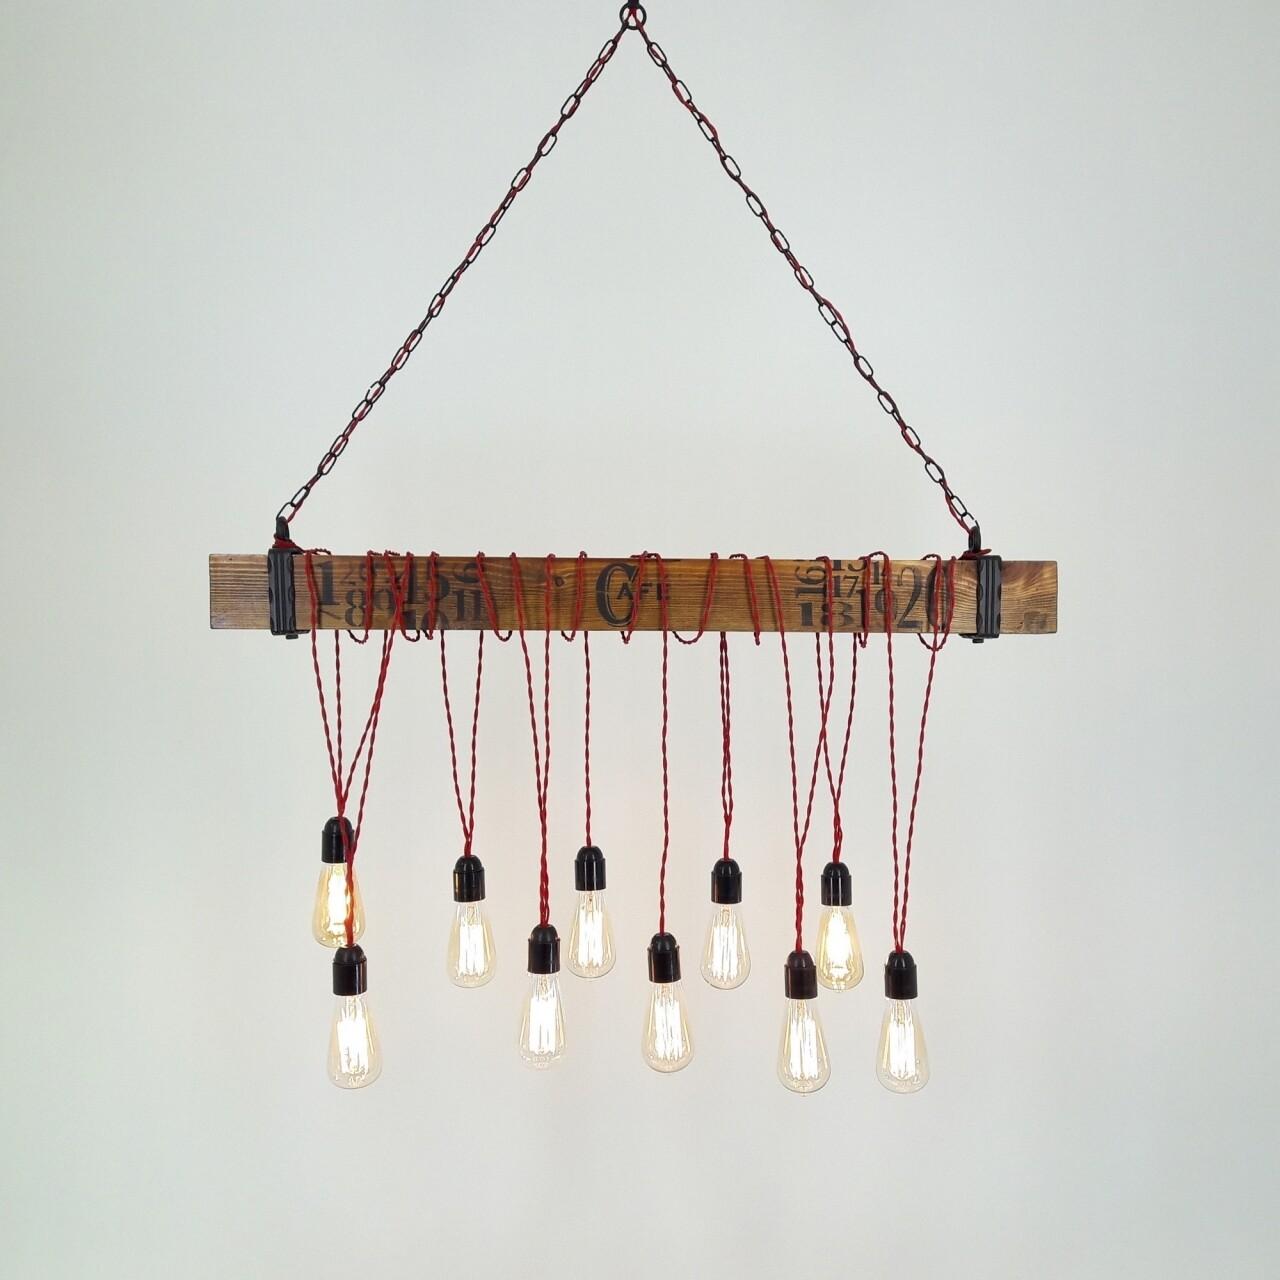 Candelabru All Design, handmade, 100x120x15 cm, White Walnut